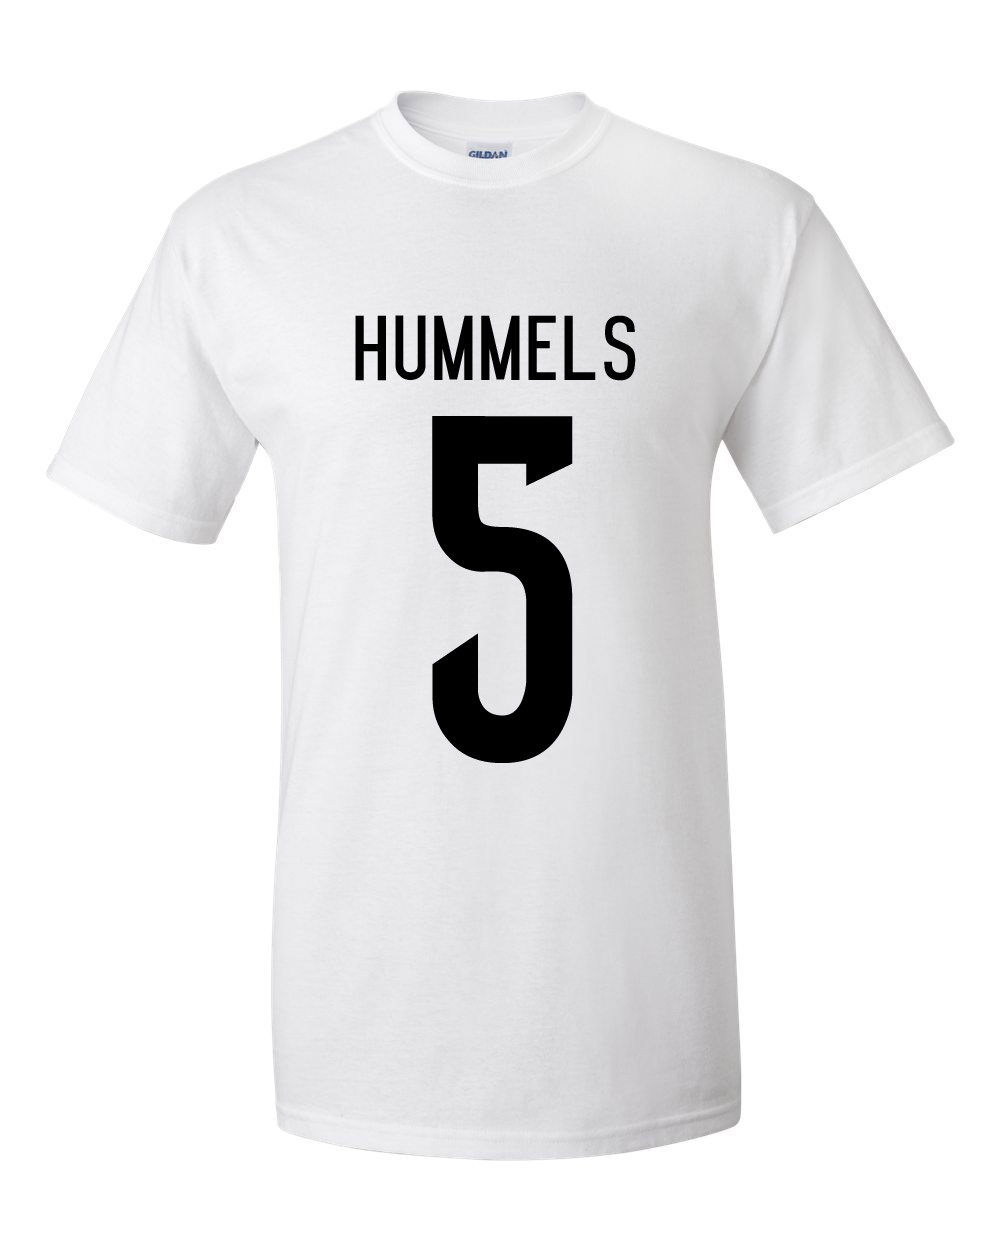 sale retailer 84d77 1faf6 Mats Hummels Germany Hero T-shirt (white)